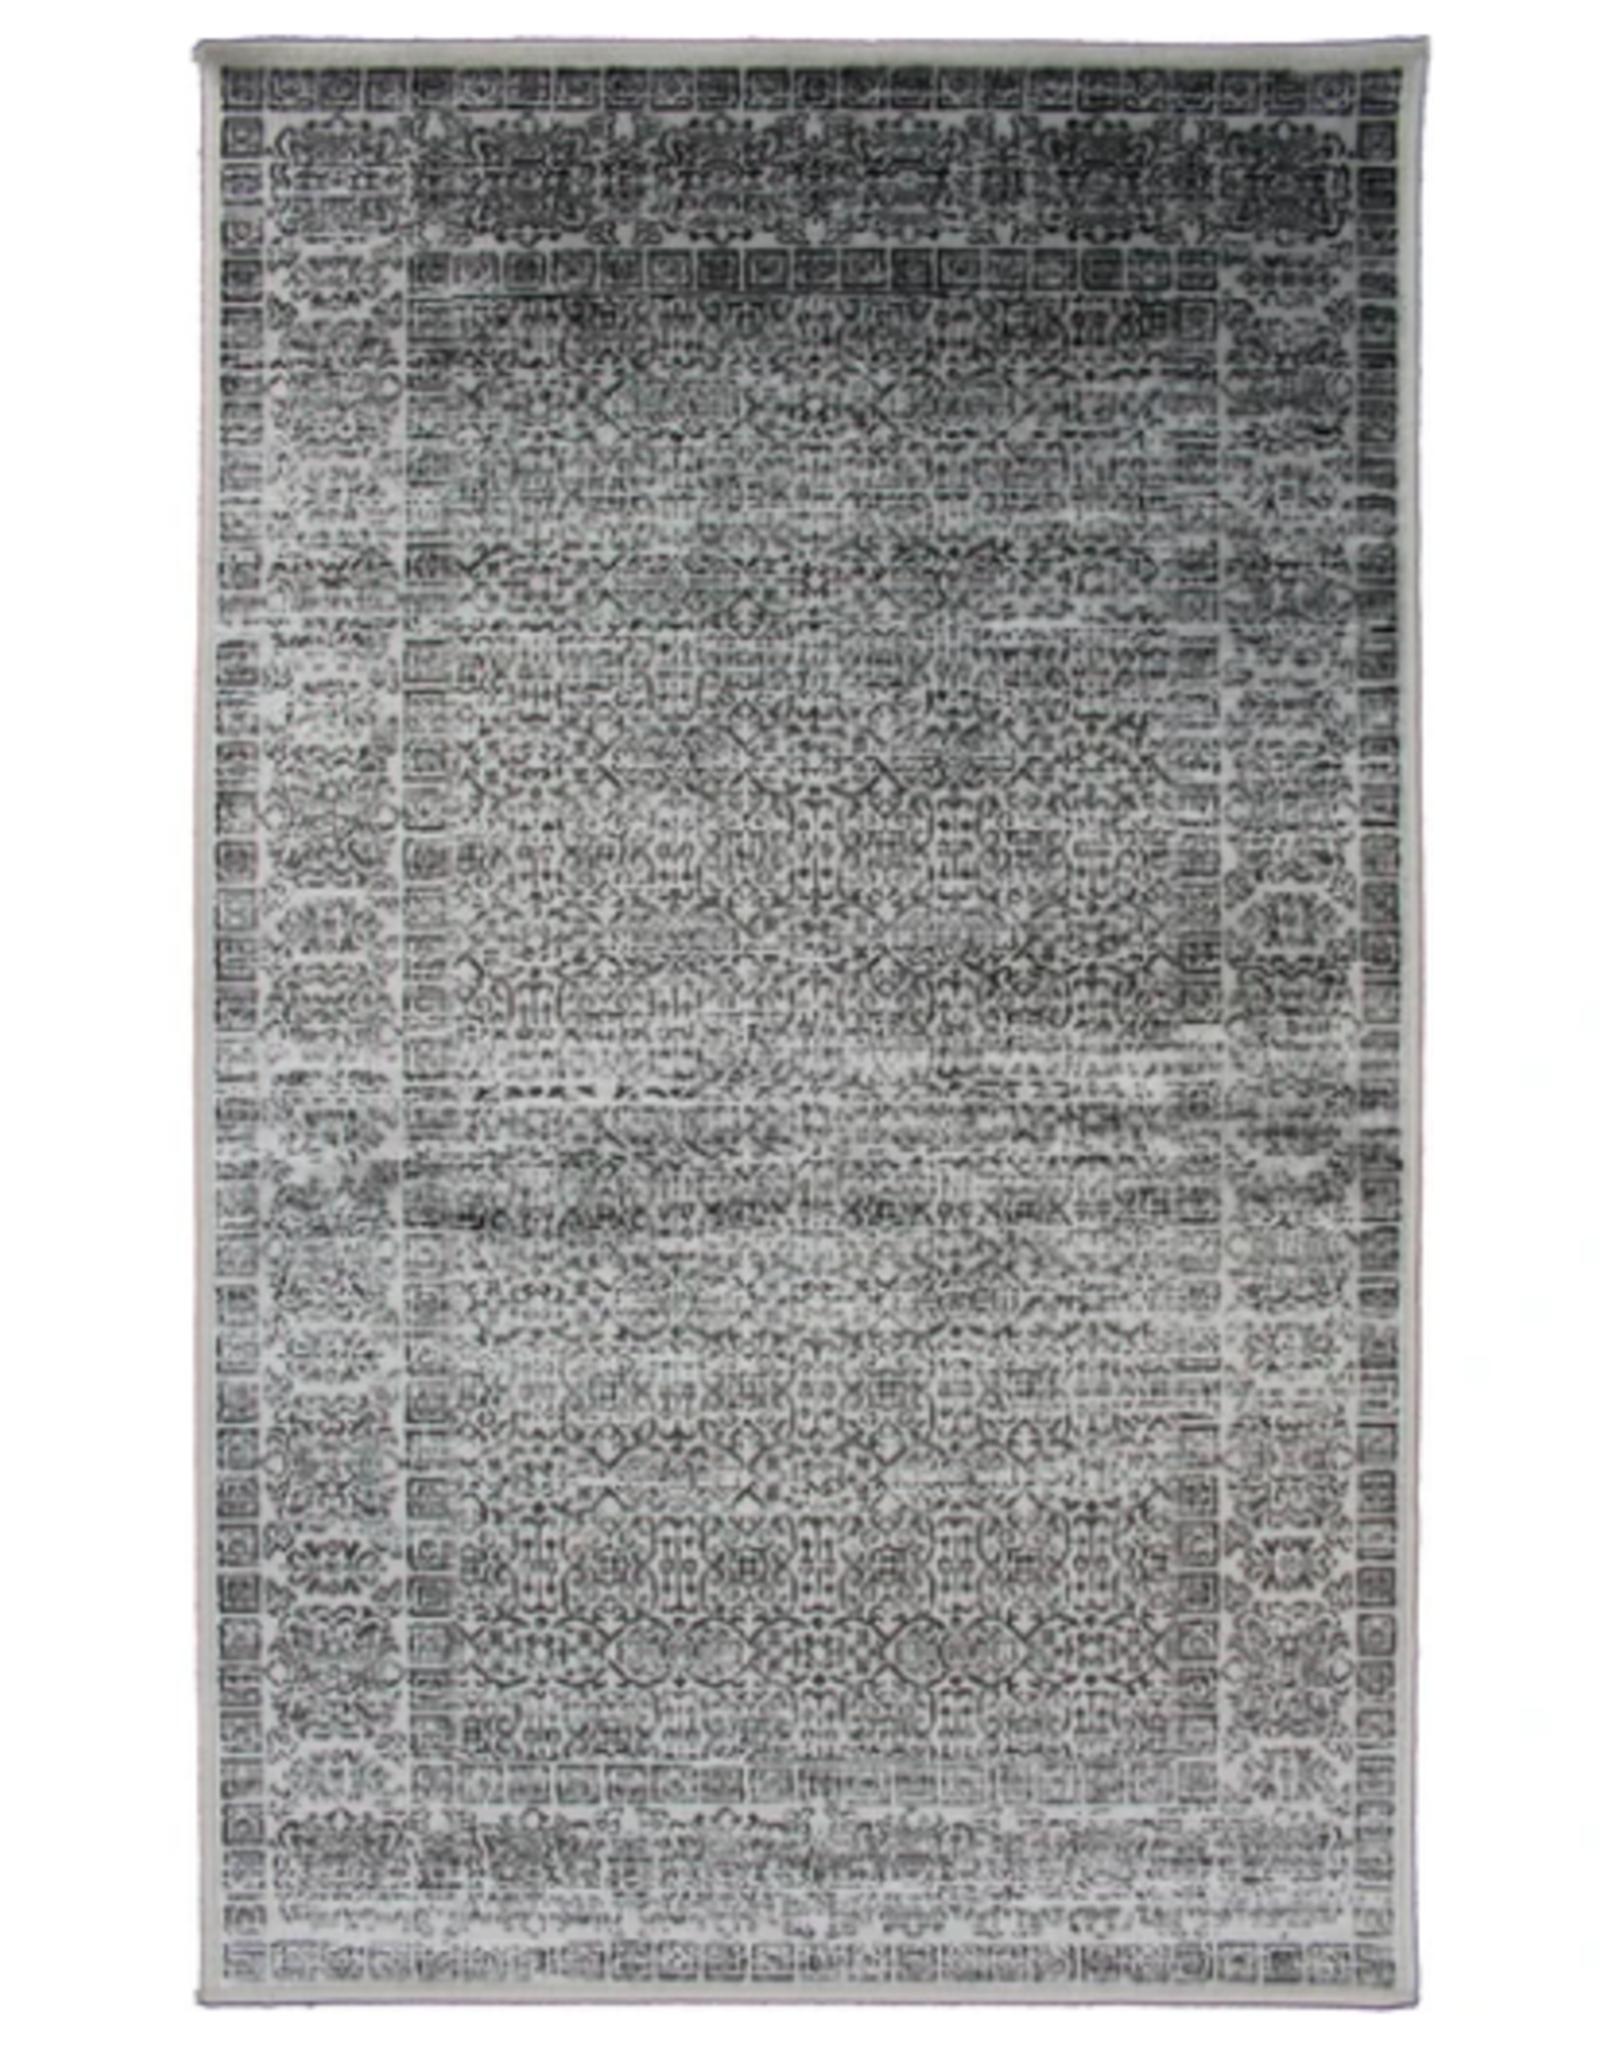 Rugs Avocado Artificial Silk 2'4 x 3'7 Azura Silver / Anthracite